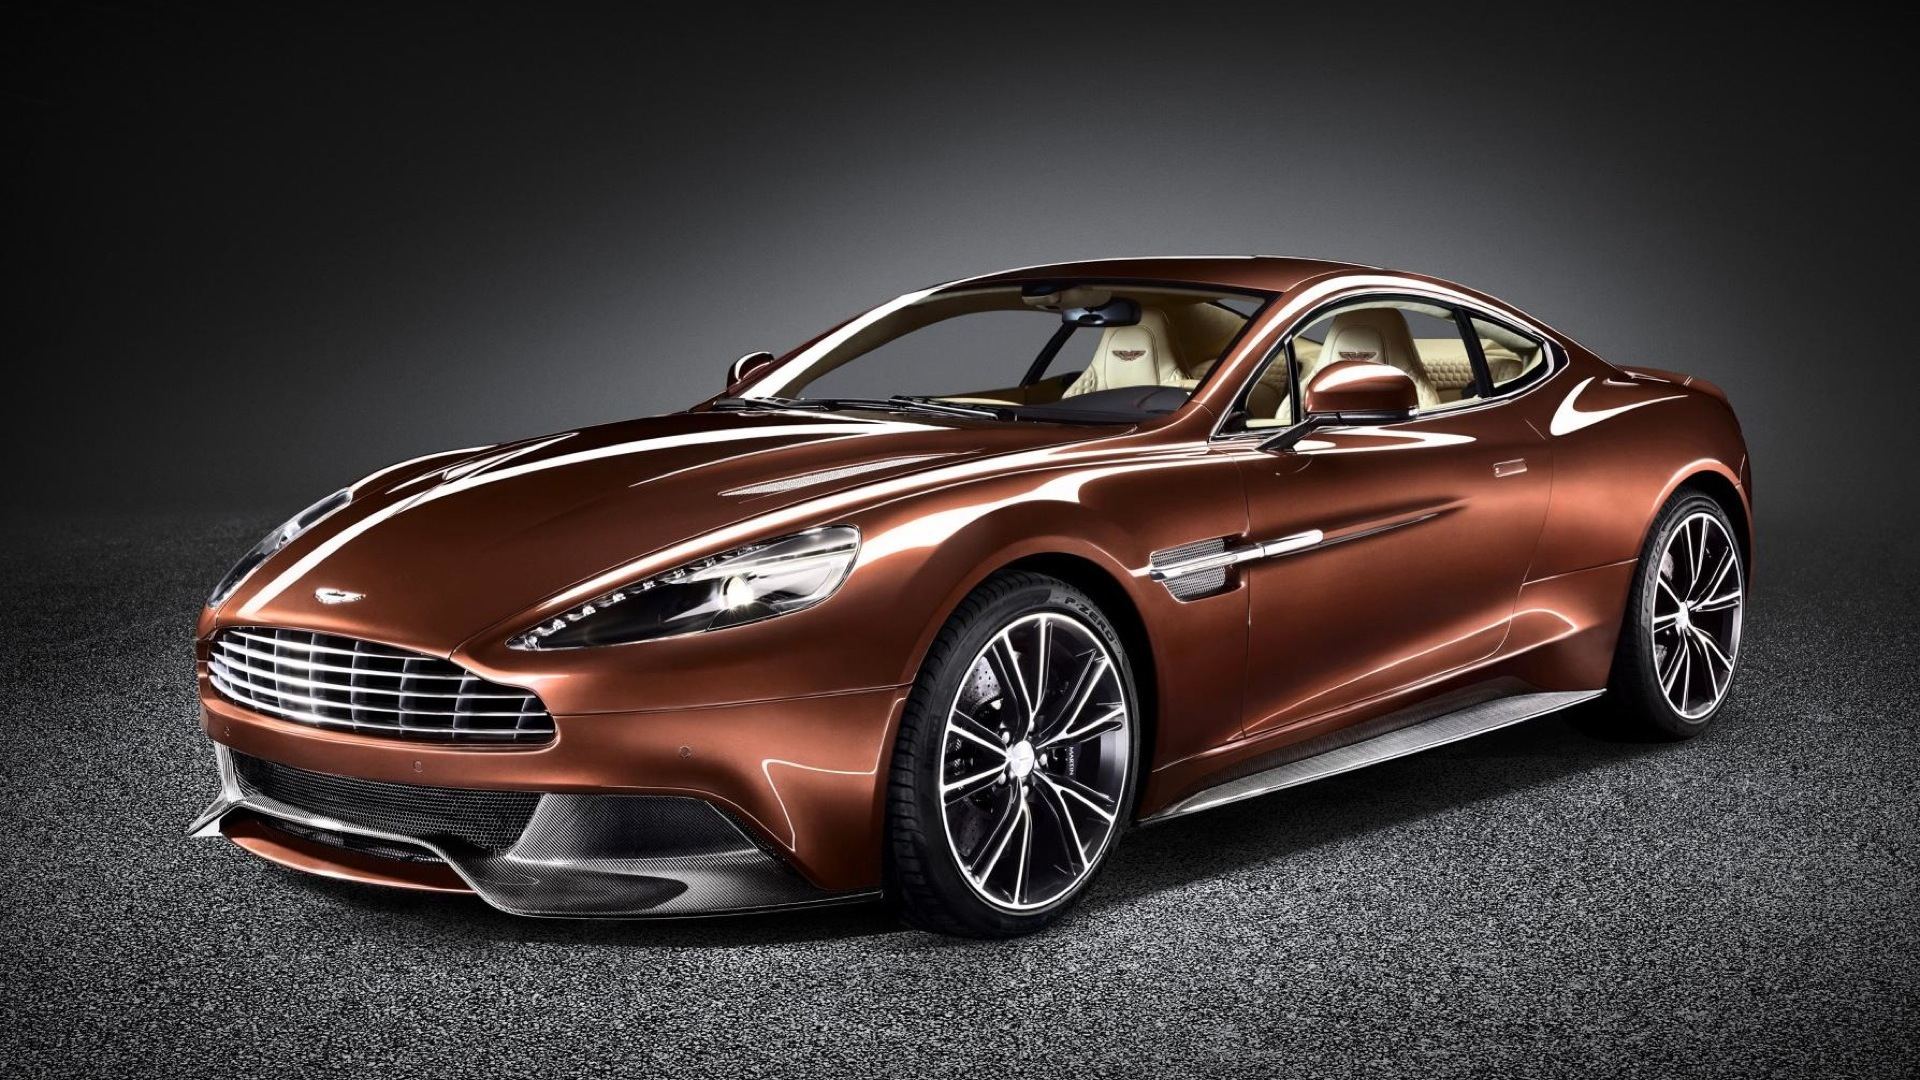 Aston Martin Vanquish 2013 STD